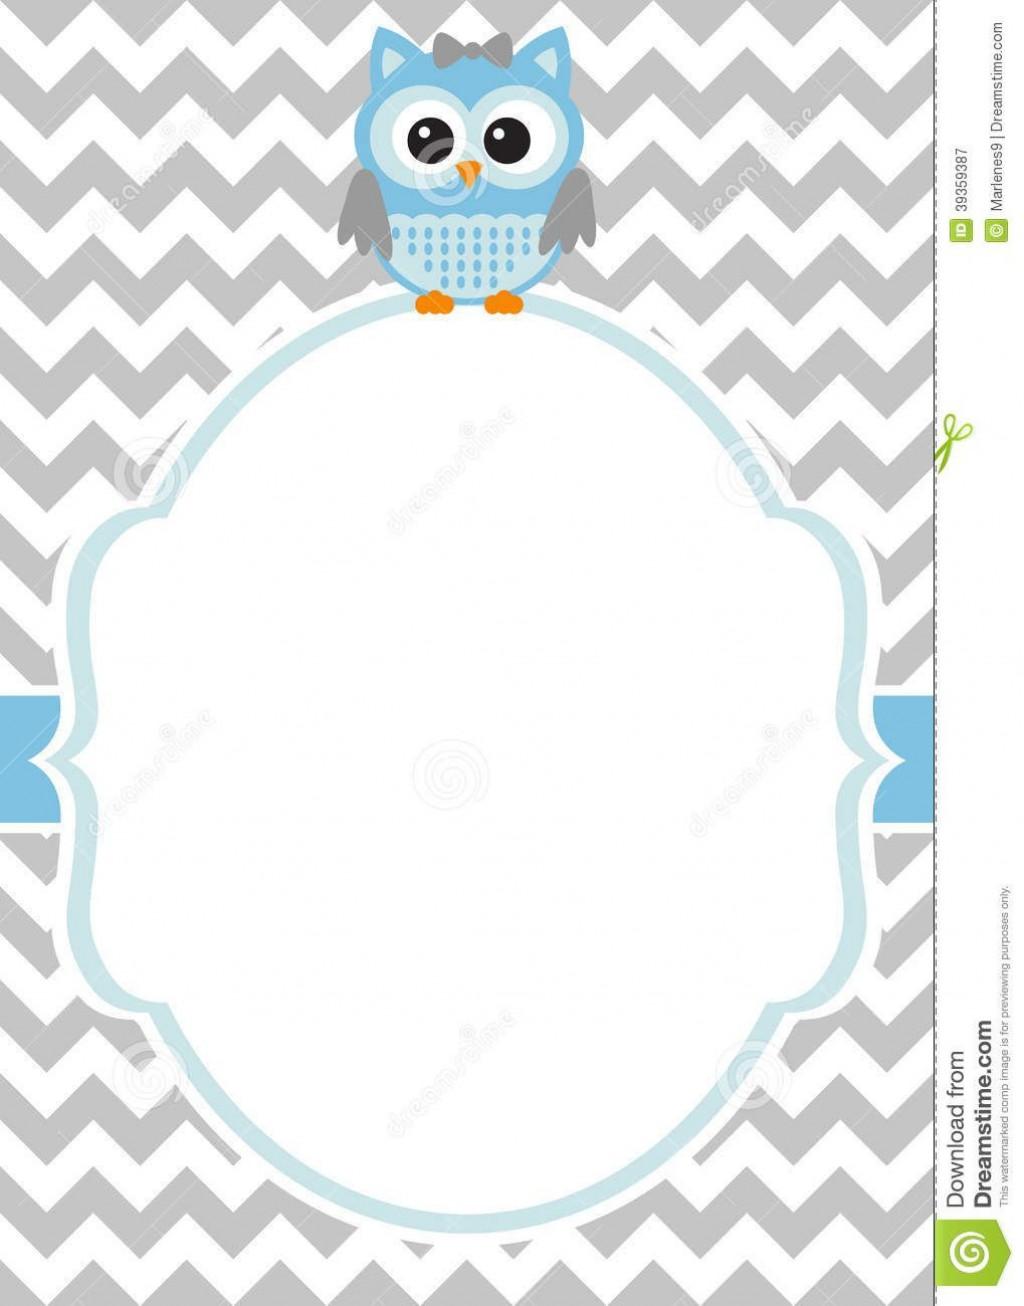 006 Sensational Free Printable Baby Shower Card For Boy Idea  BingoLarge